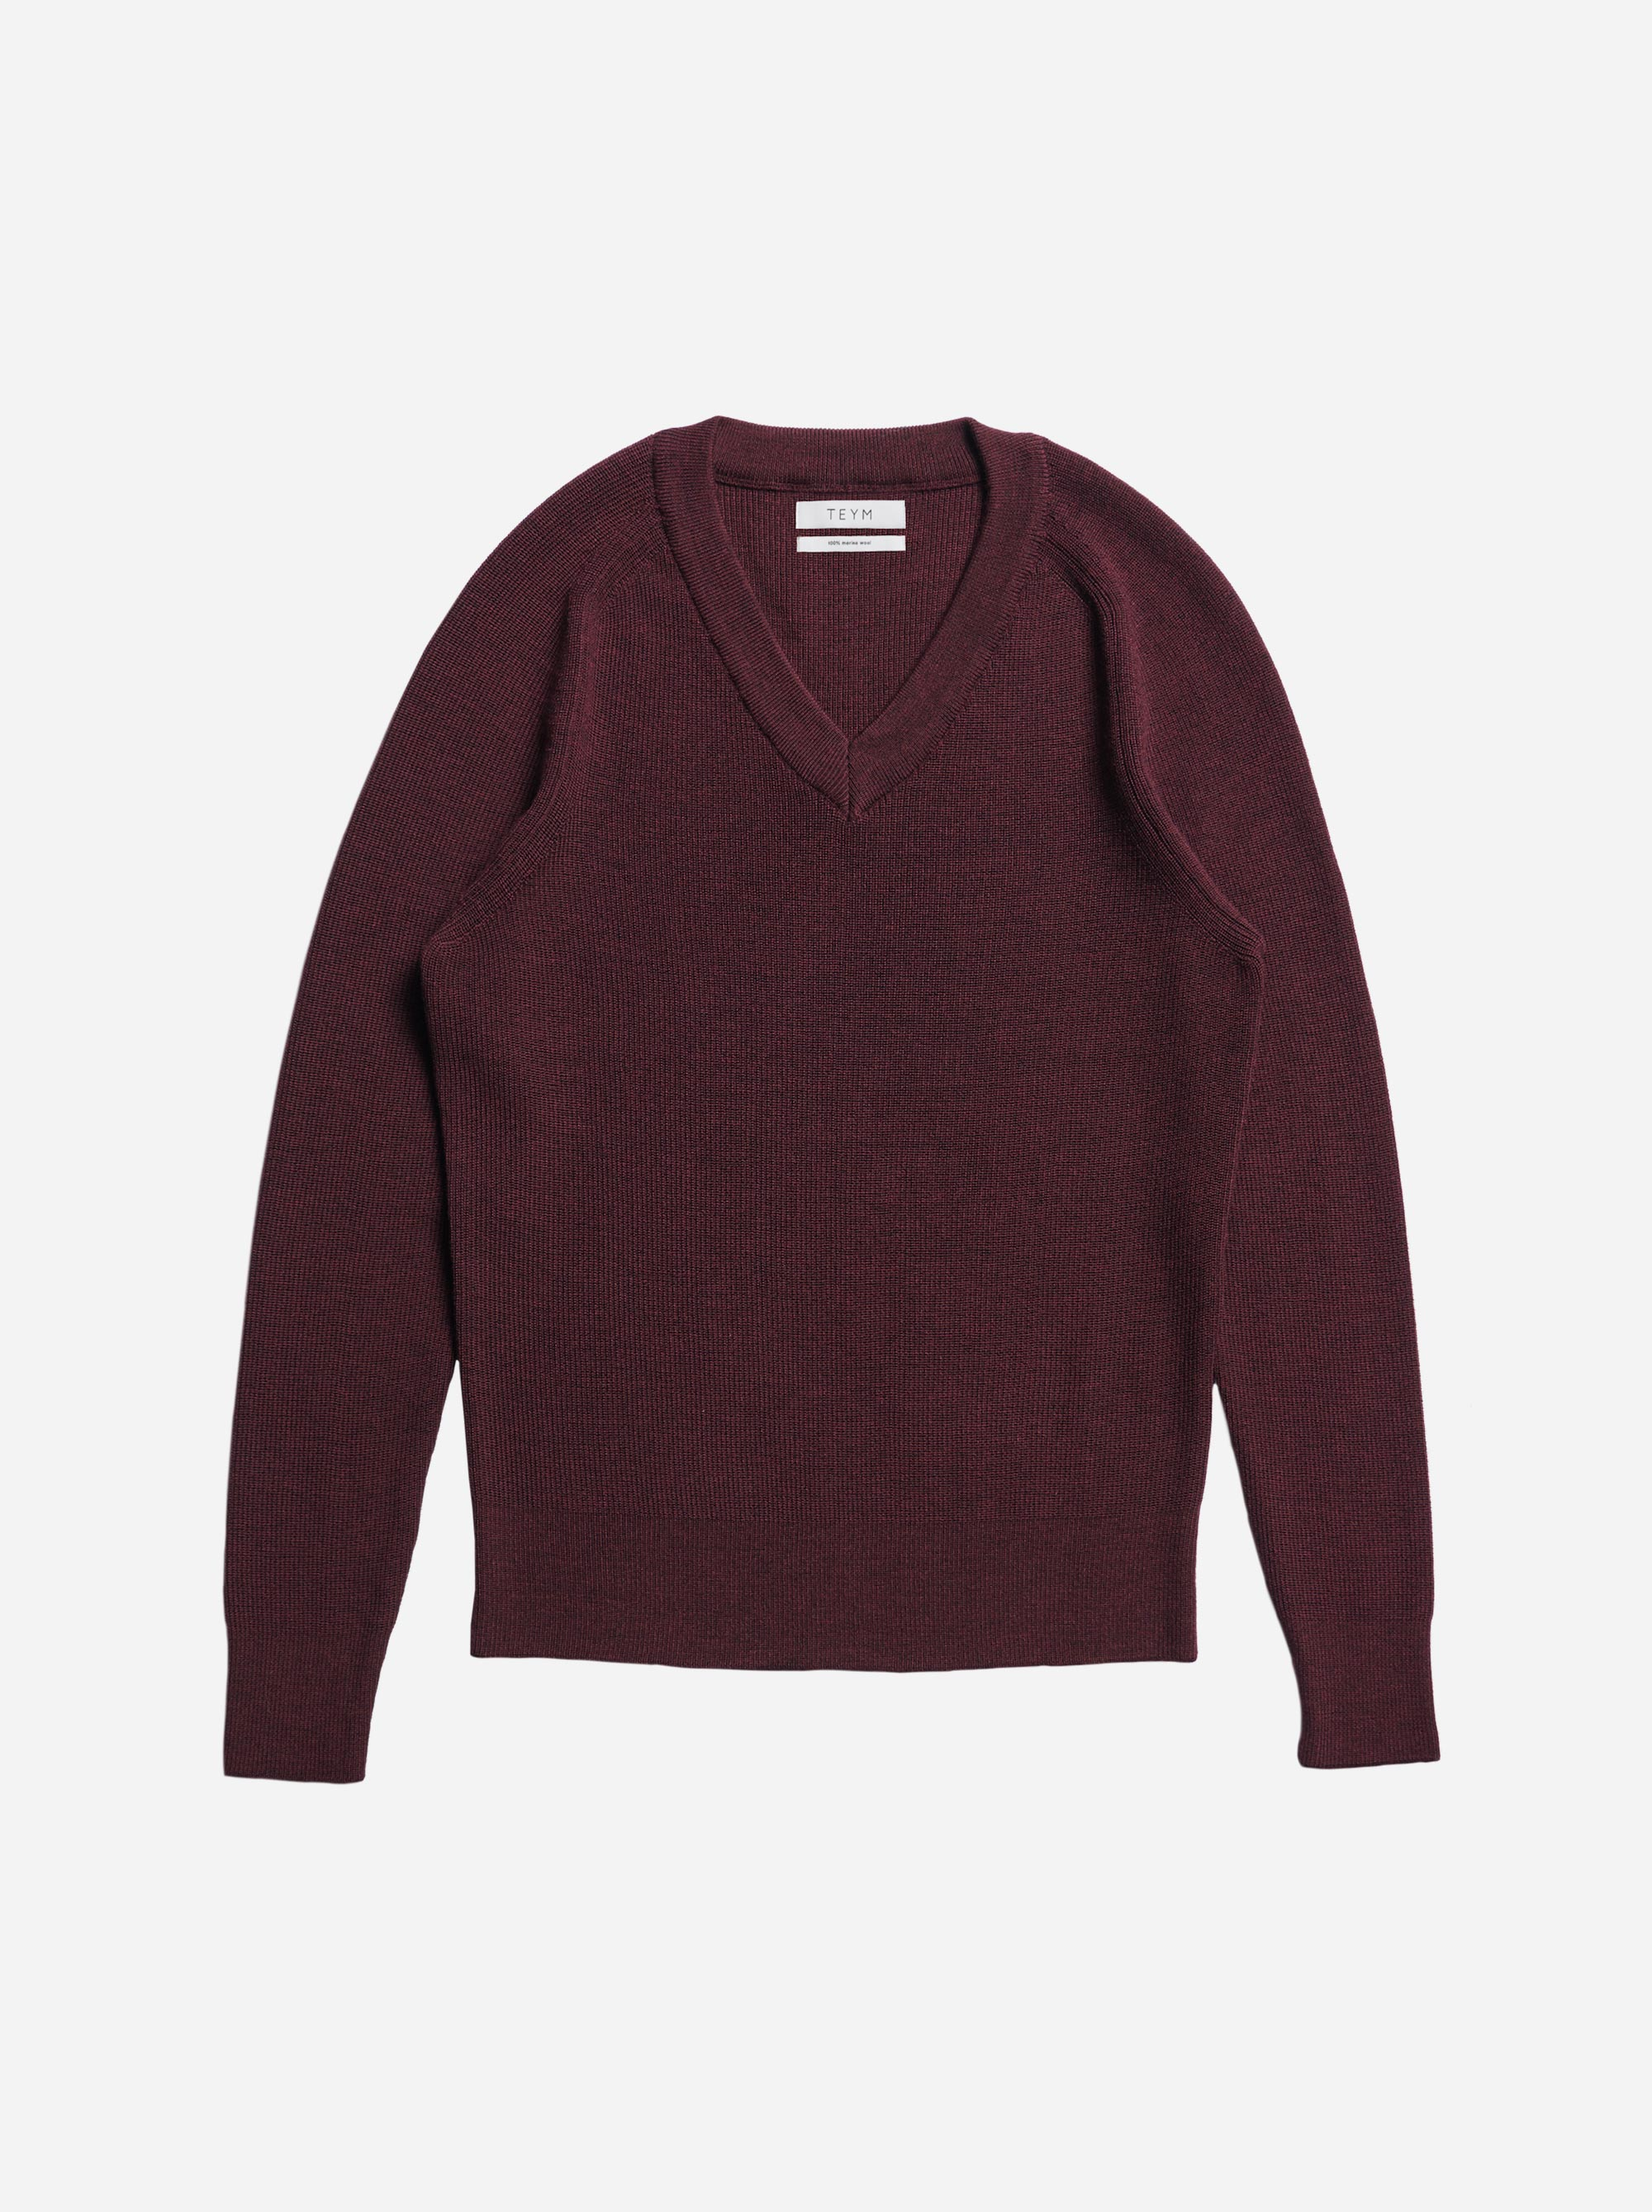 Teym - V-Neck - The Merino Sweater - Women - Burgundy - 4